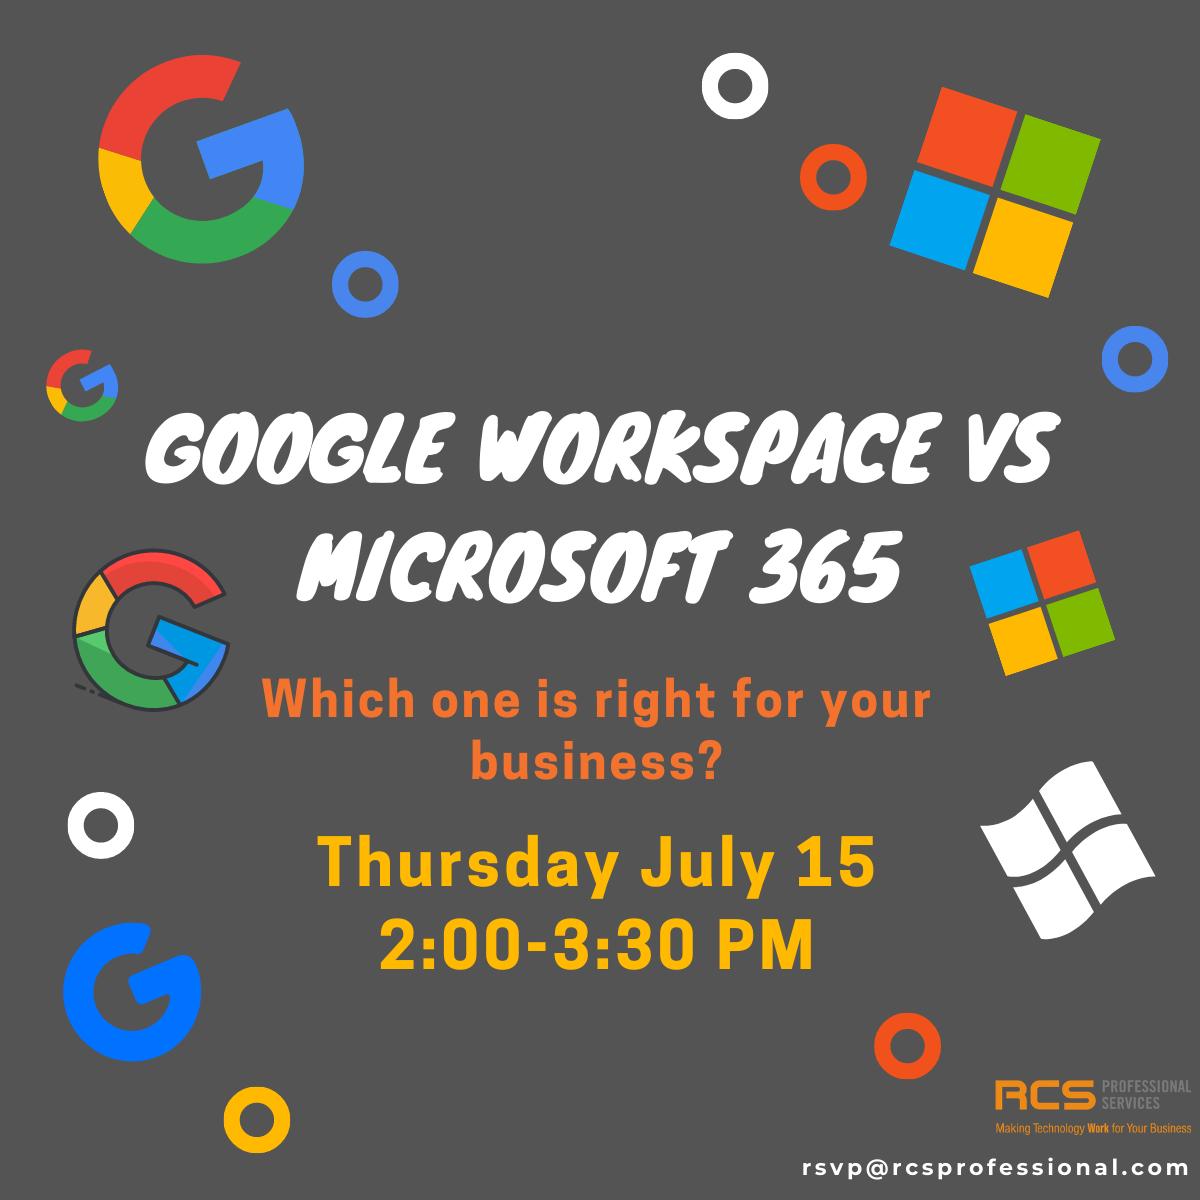 google workspace vs microsoft 365 webinar flyers (4)